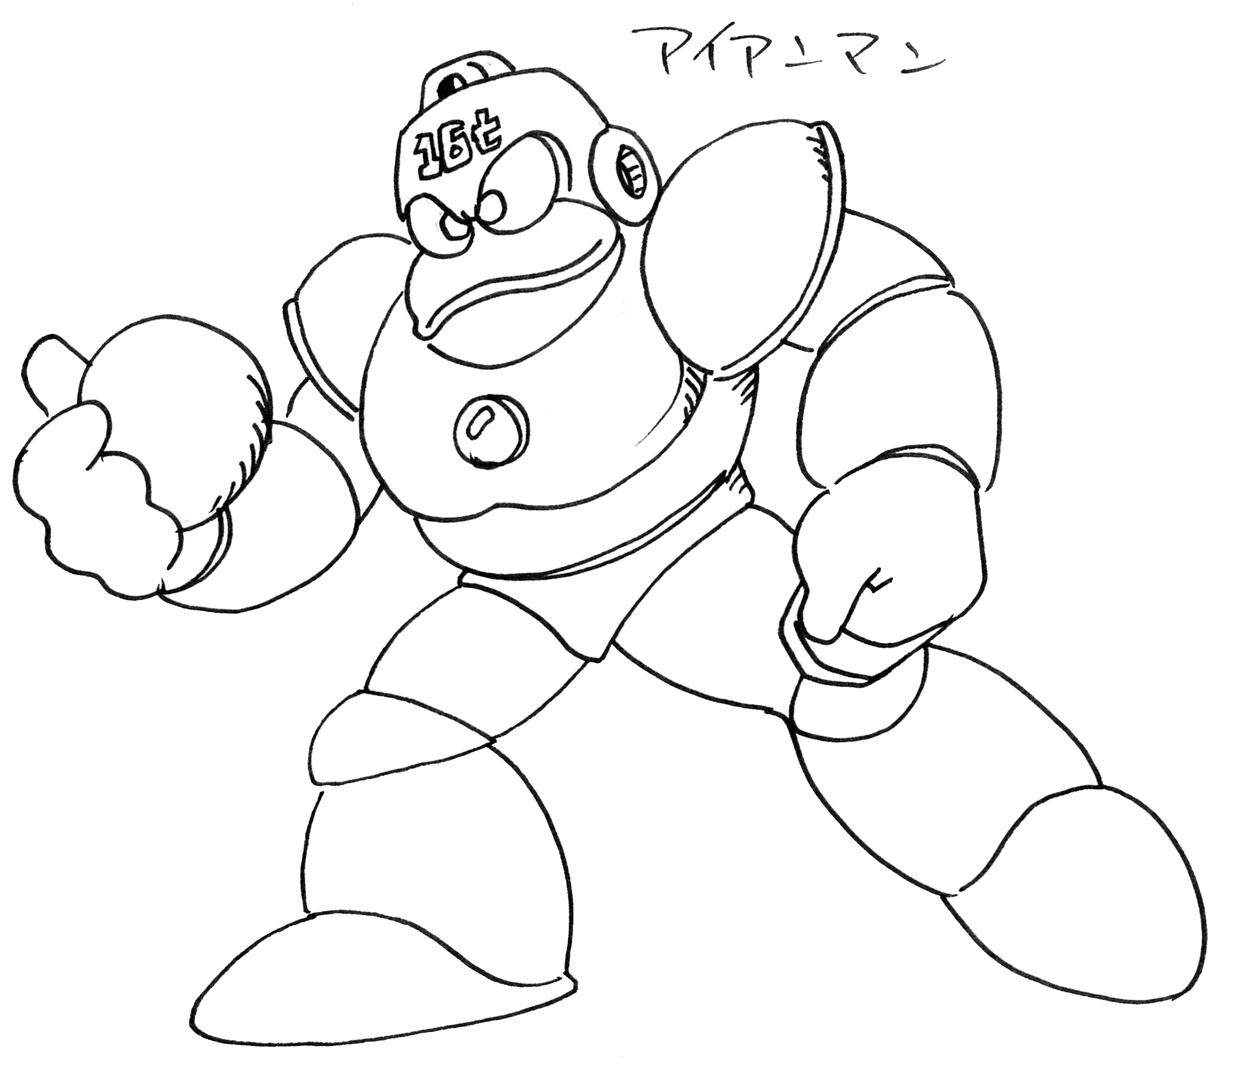 Megaman x coloring pages -  Mega Man 6